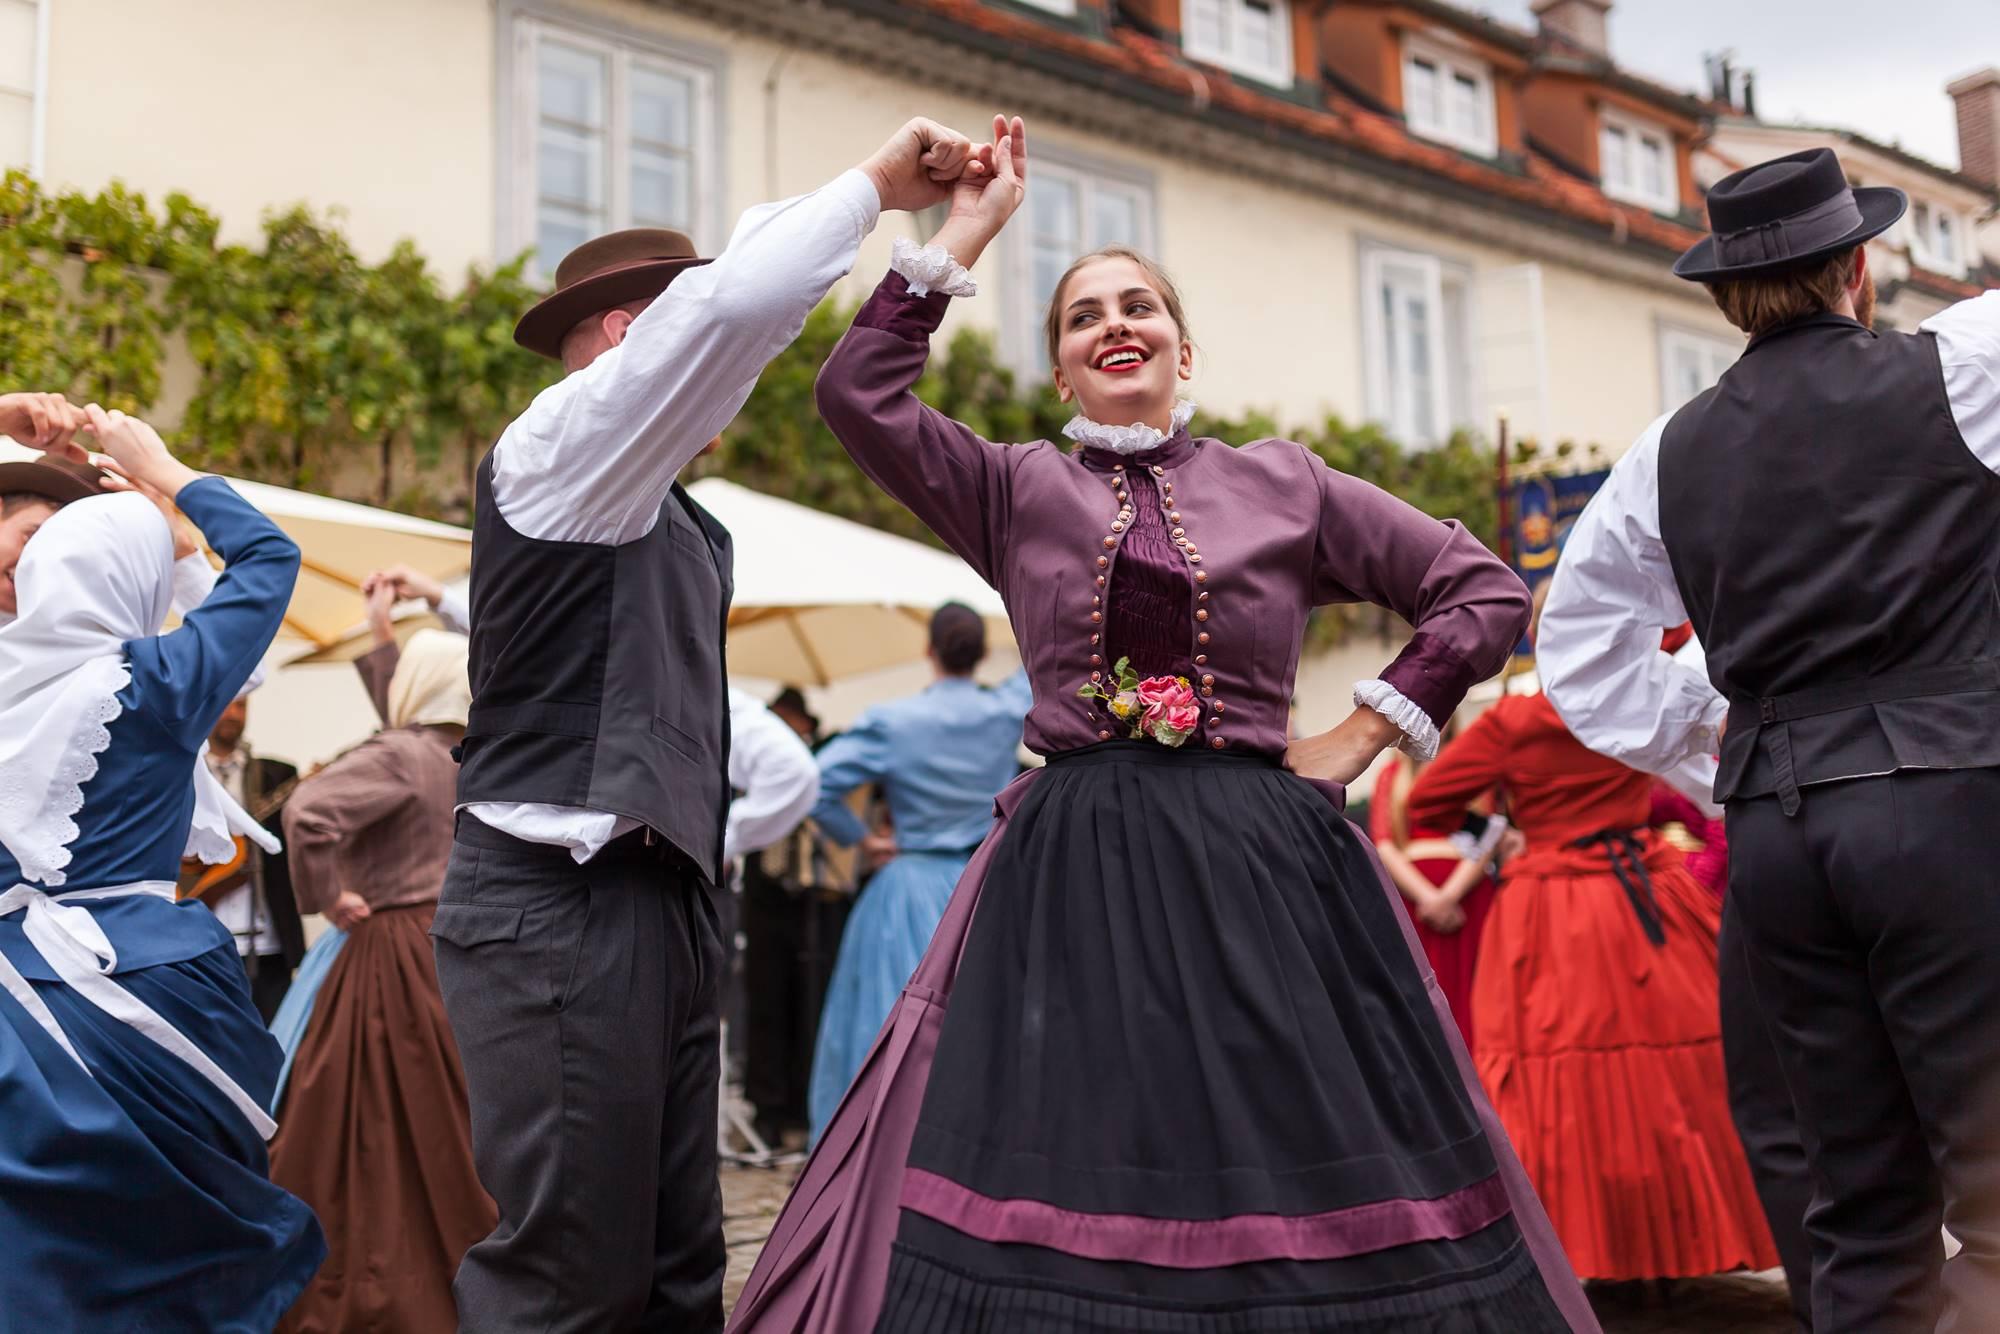 The Old Vine Festival